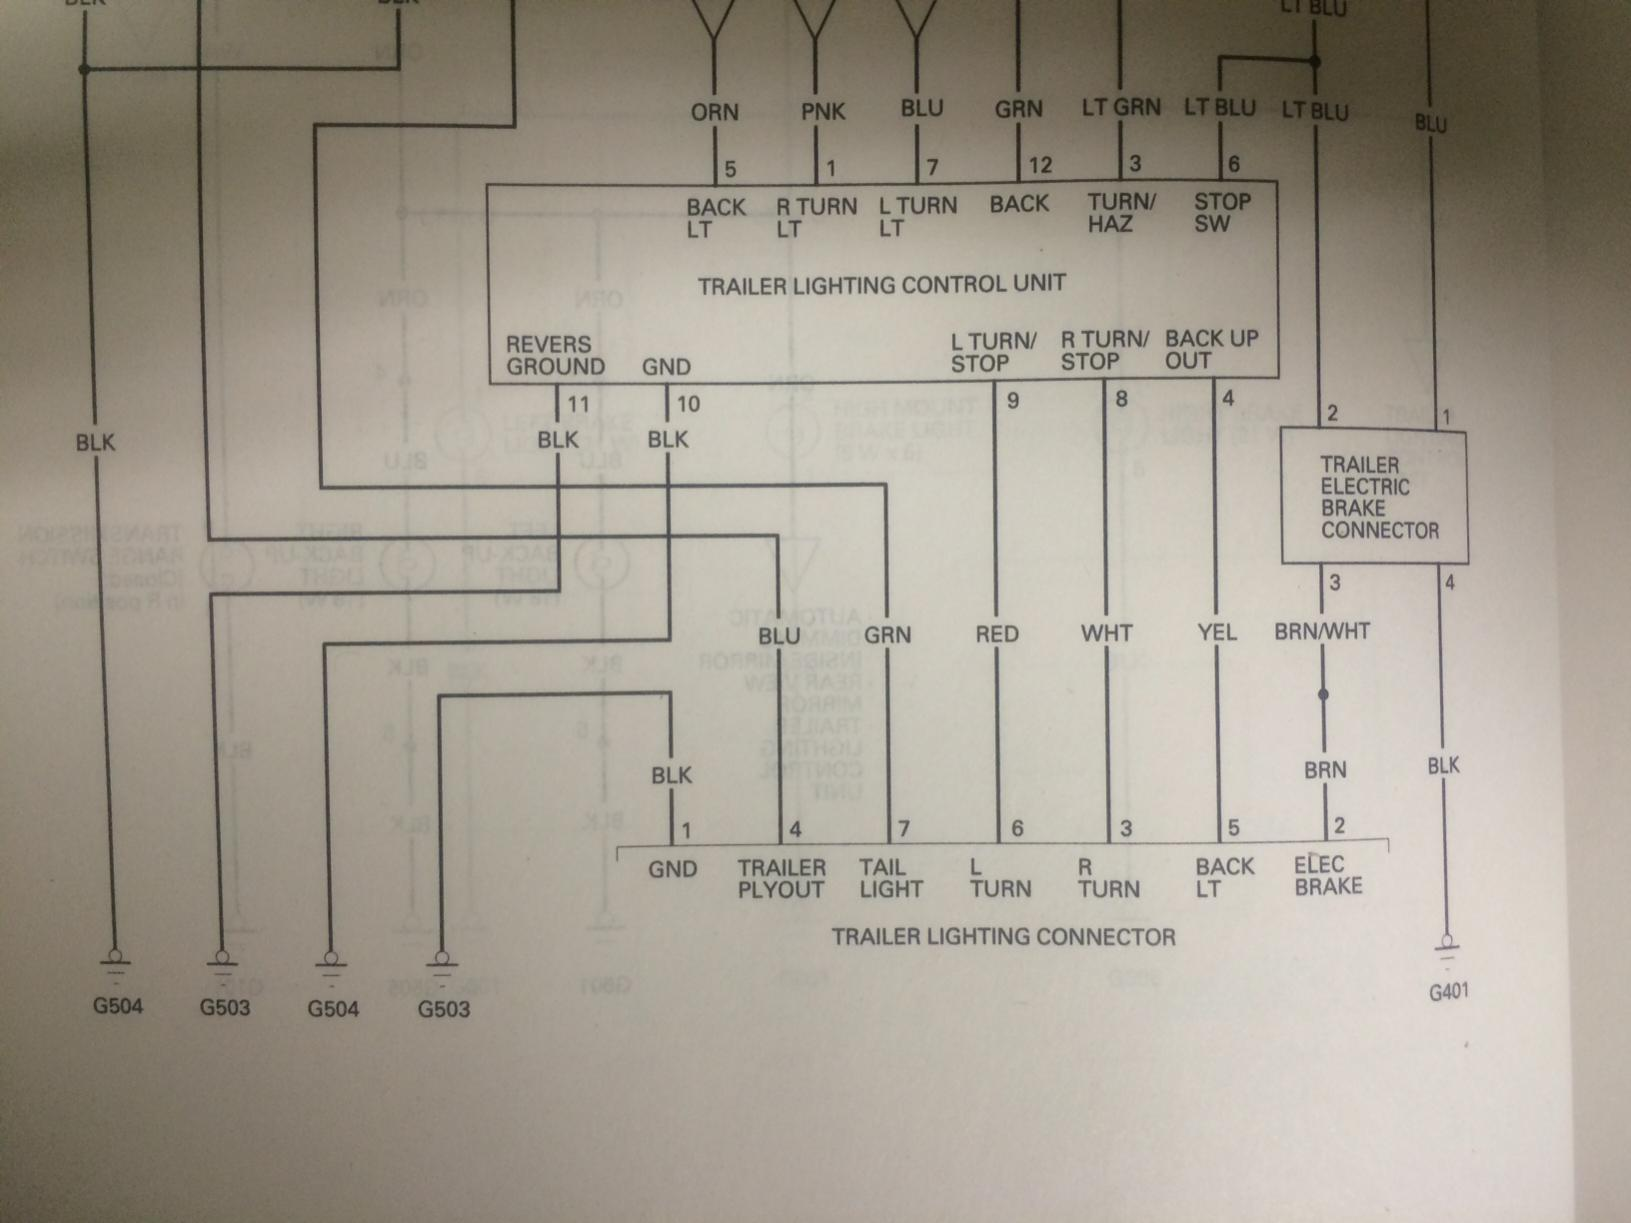 2011 honda pilot hitch wiring - wiring diagram rob-colab -  rob-colab.pennyapp.it  pennyapp.it